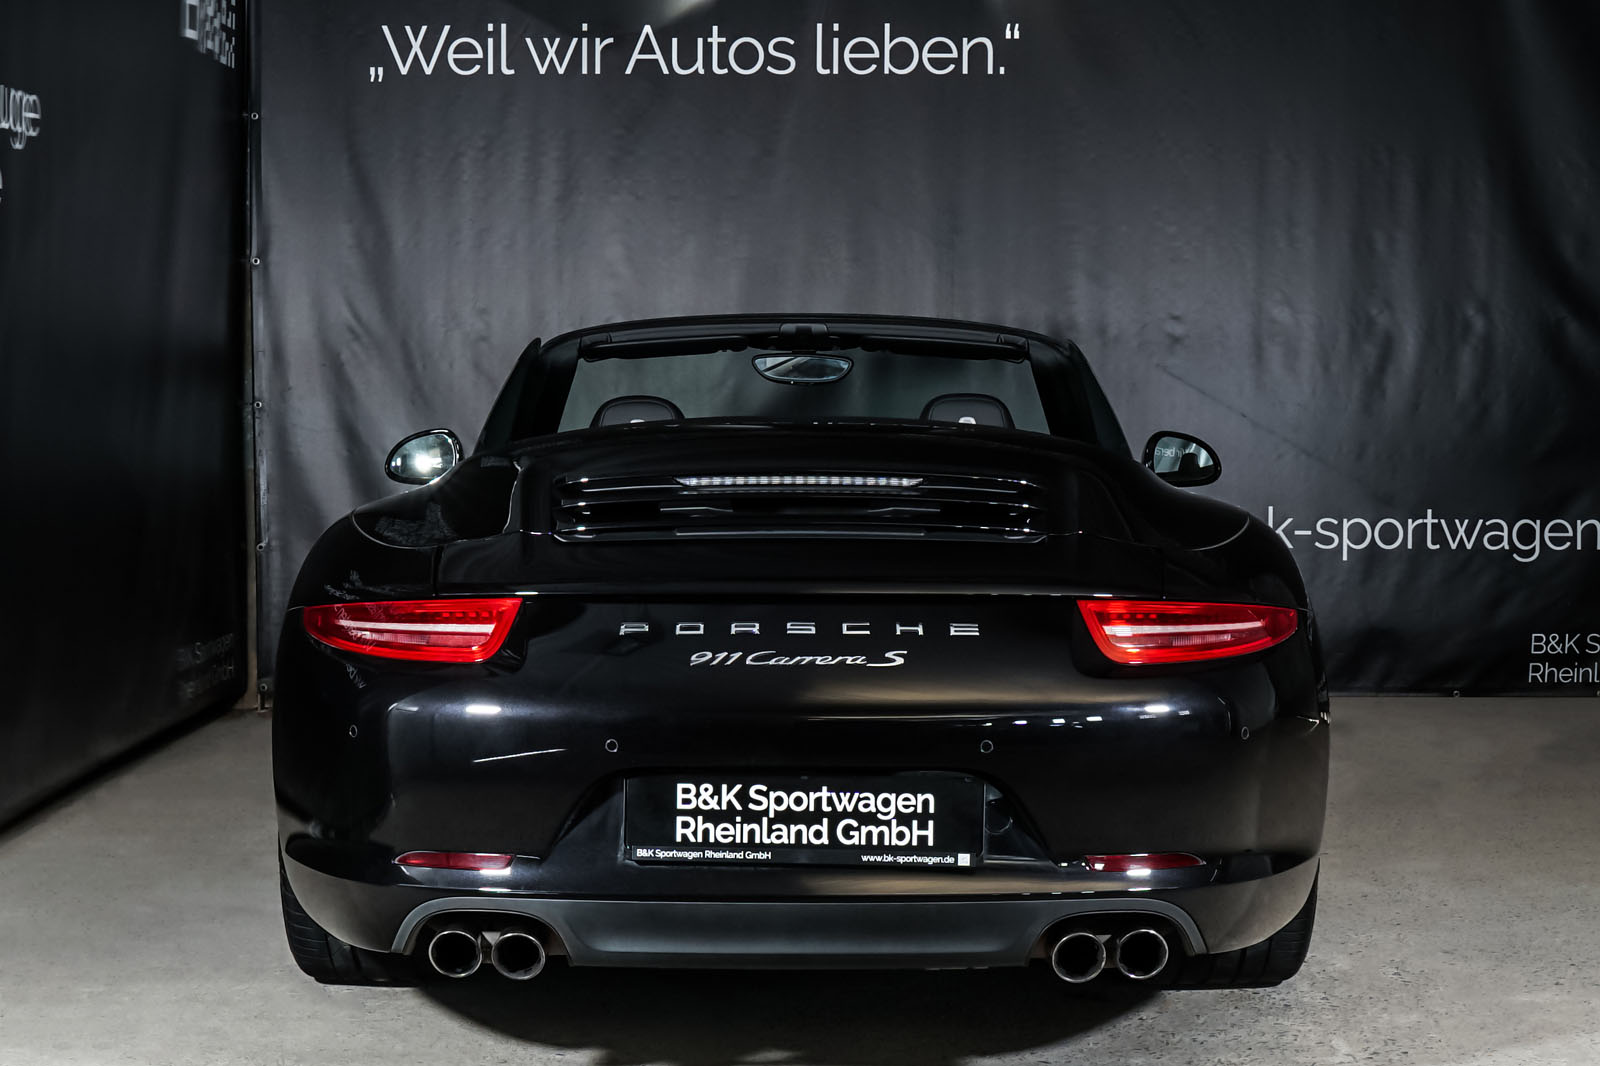 Porsche_991_CarreraS_Cabrio_Schwarz_Schwarz_POR-7555_19_w